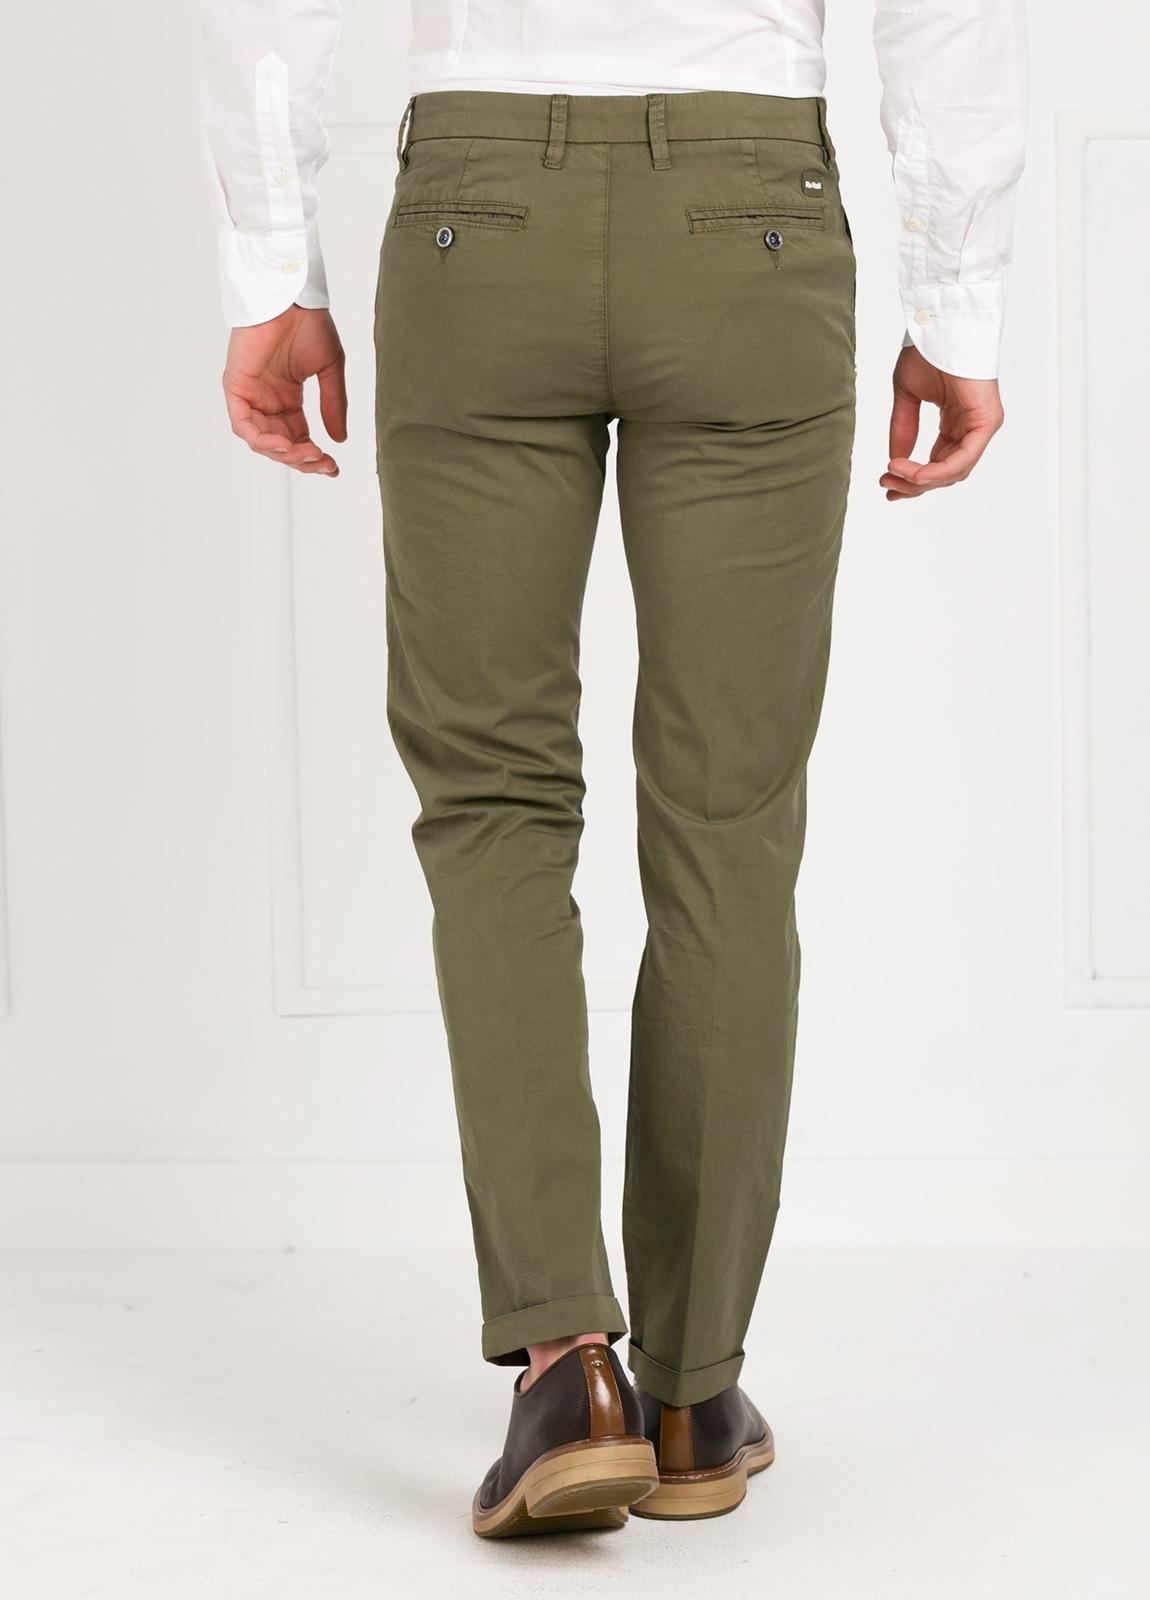 Pantalón sport modelo MUCHA P 249 color kaki. Algodón y elastáno. - Ítem2